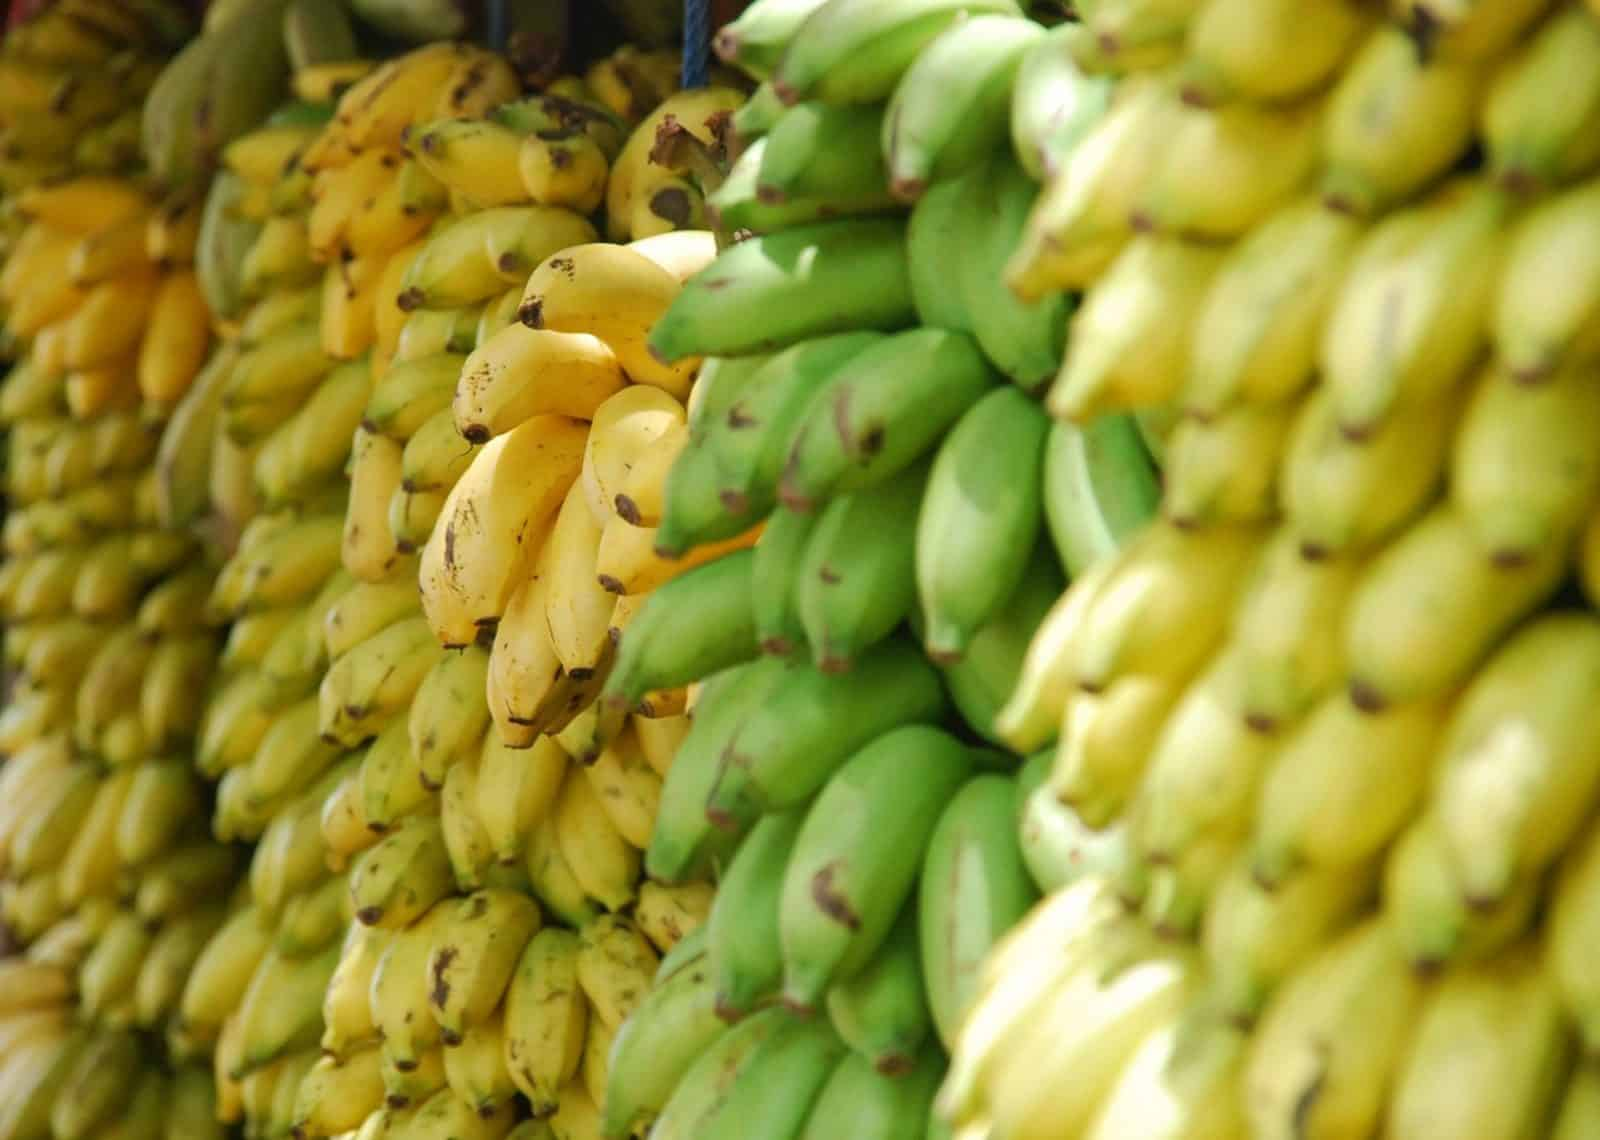 pieles de plátano sembrar tomates